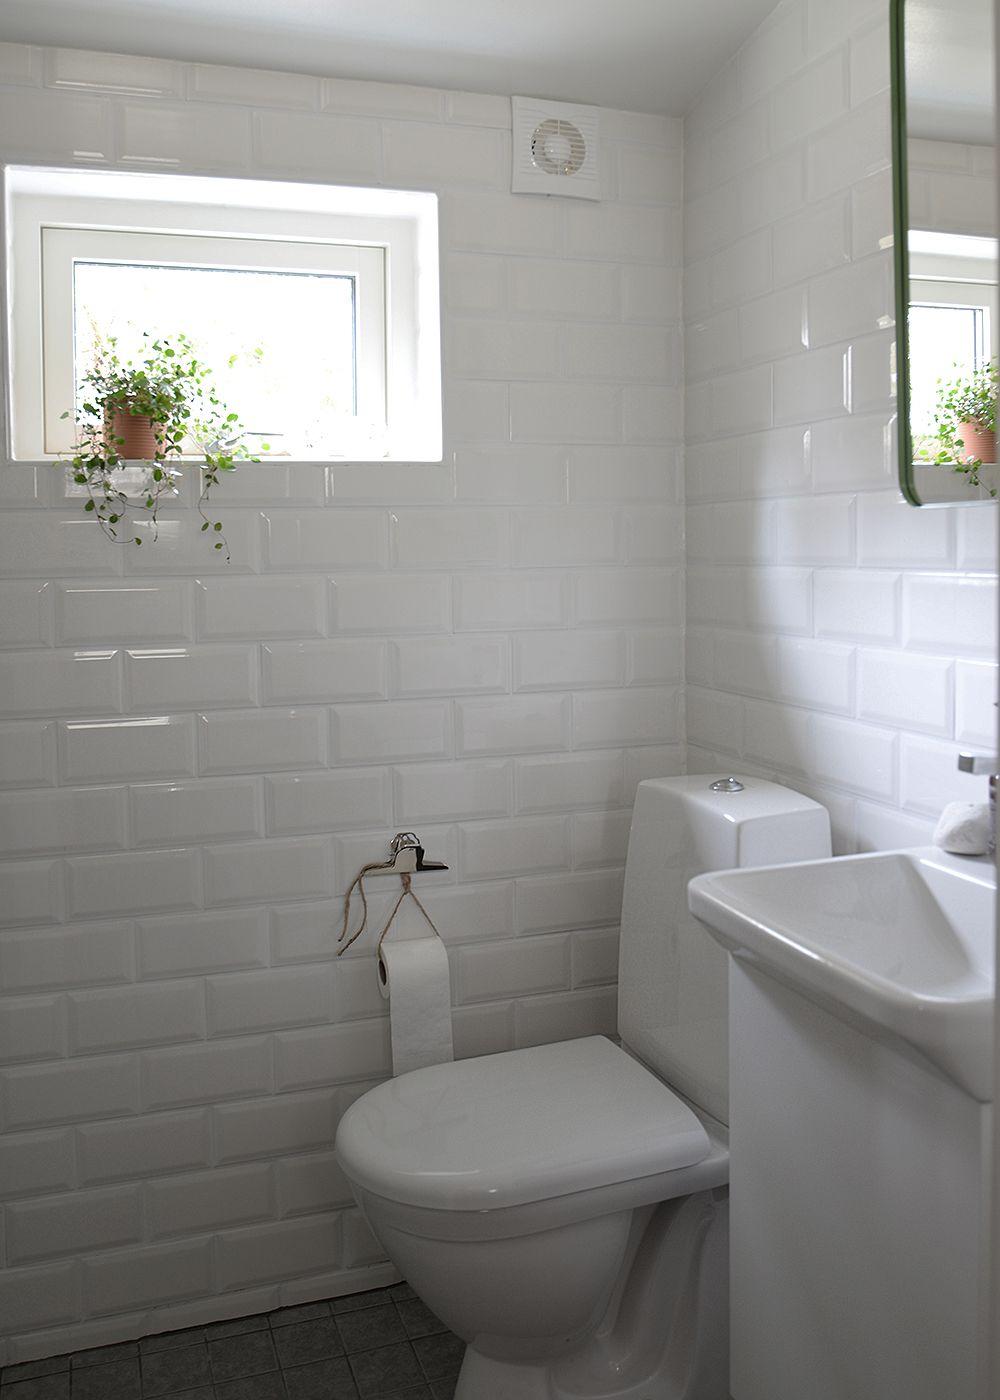 Inredning gästtoalett inspiration : www.hemtrender.se /www.svedbergs.se litet badrum, smÃ¥ badrum ...